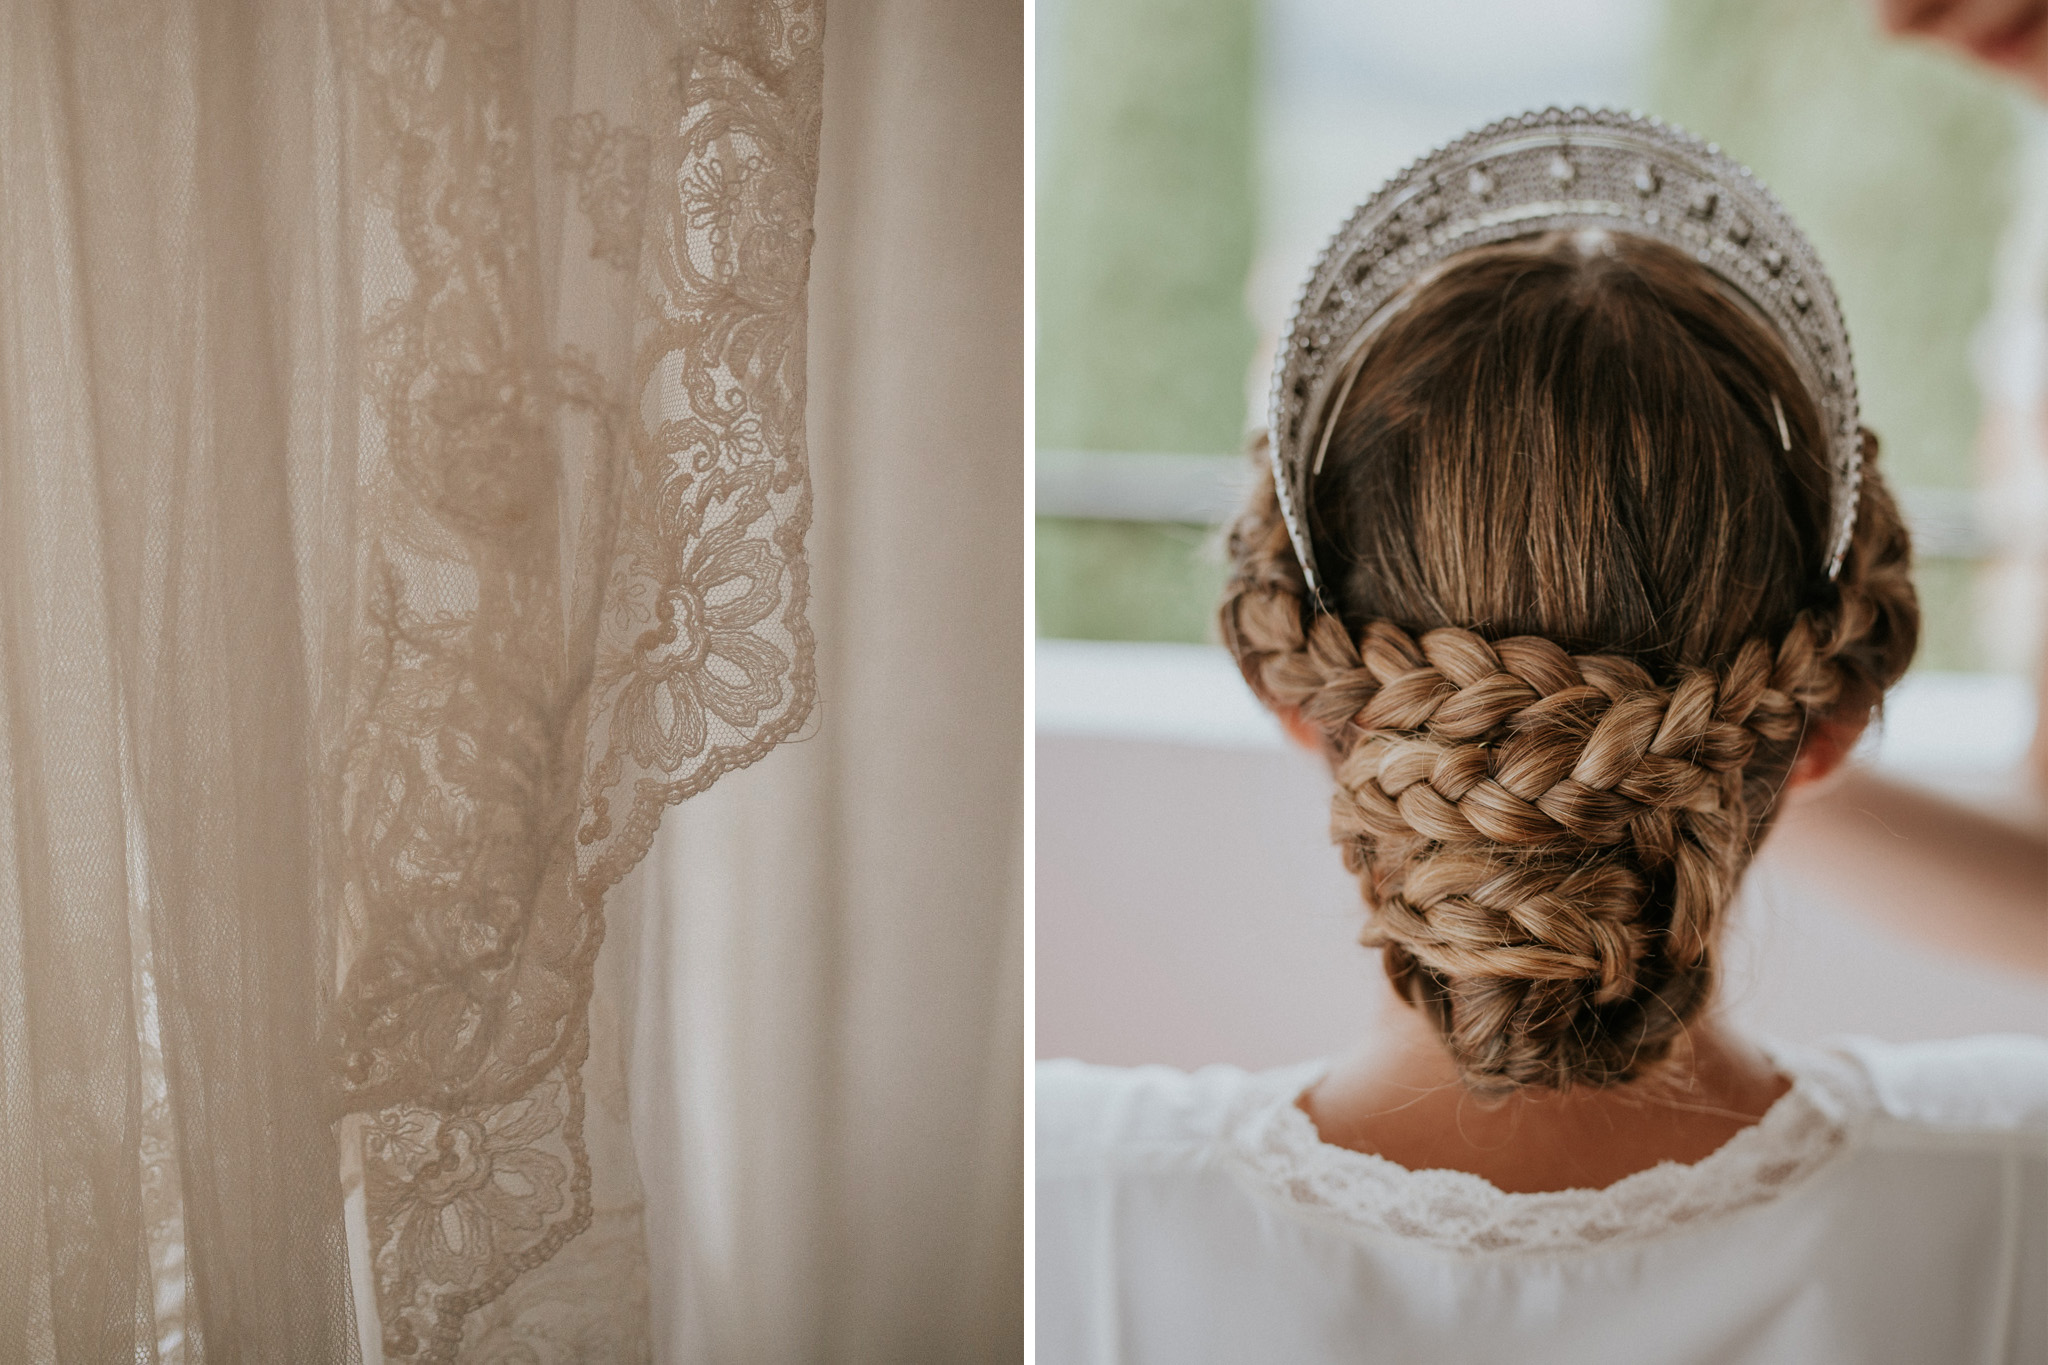 fotografia-boda-wedding-photographer-spain-concorazon-15